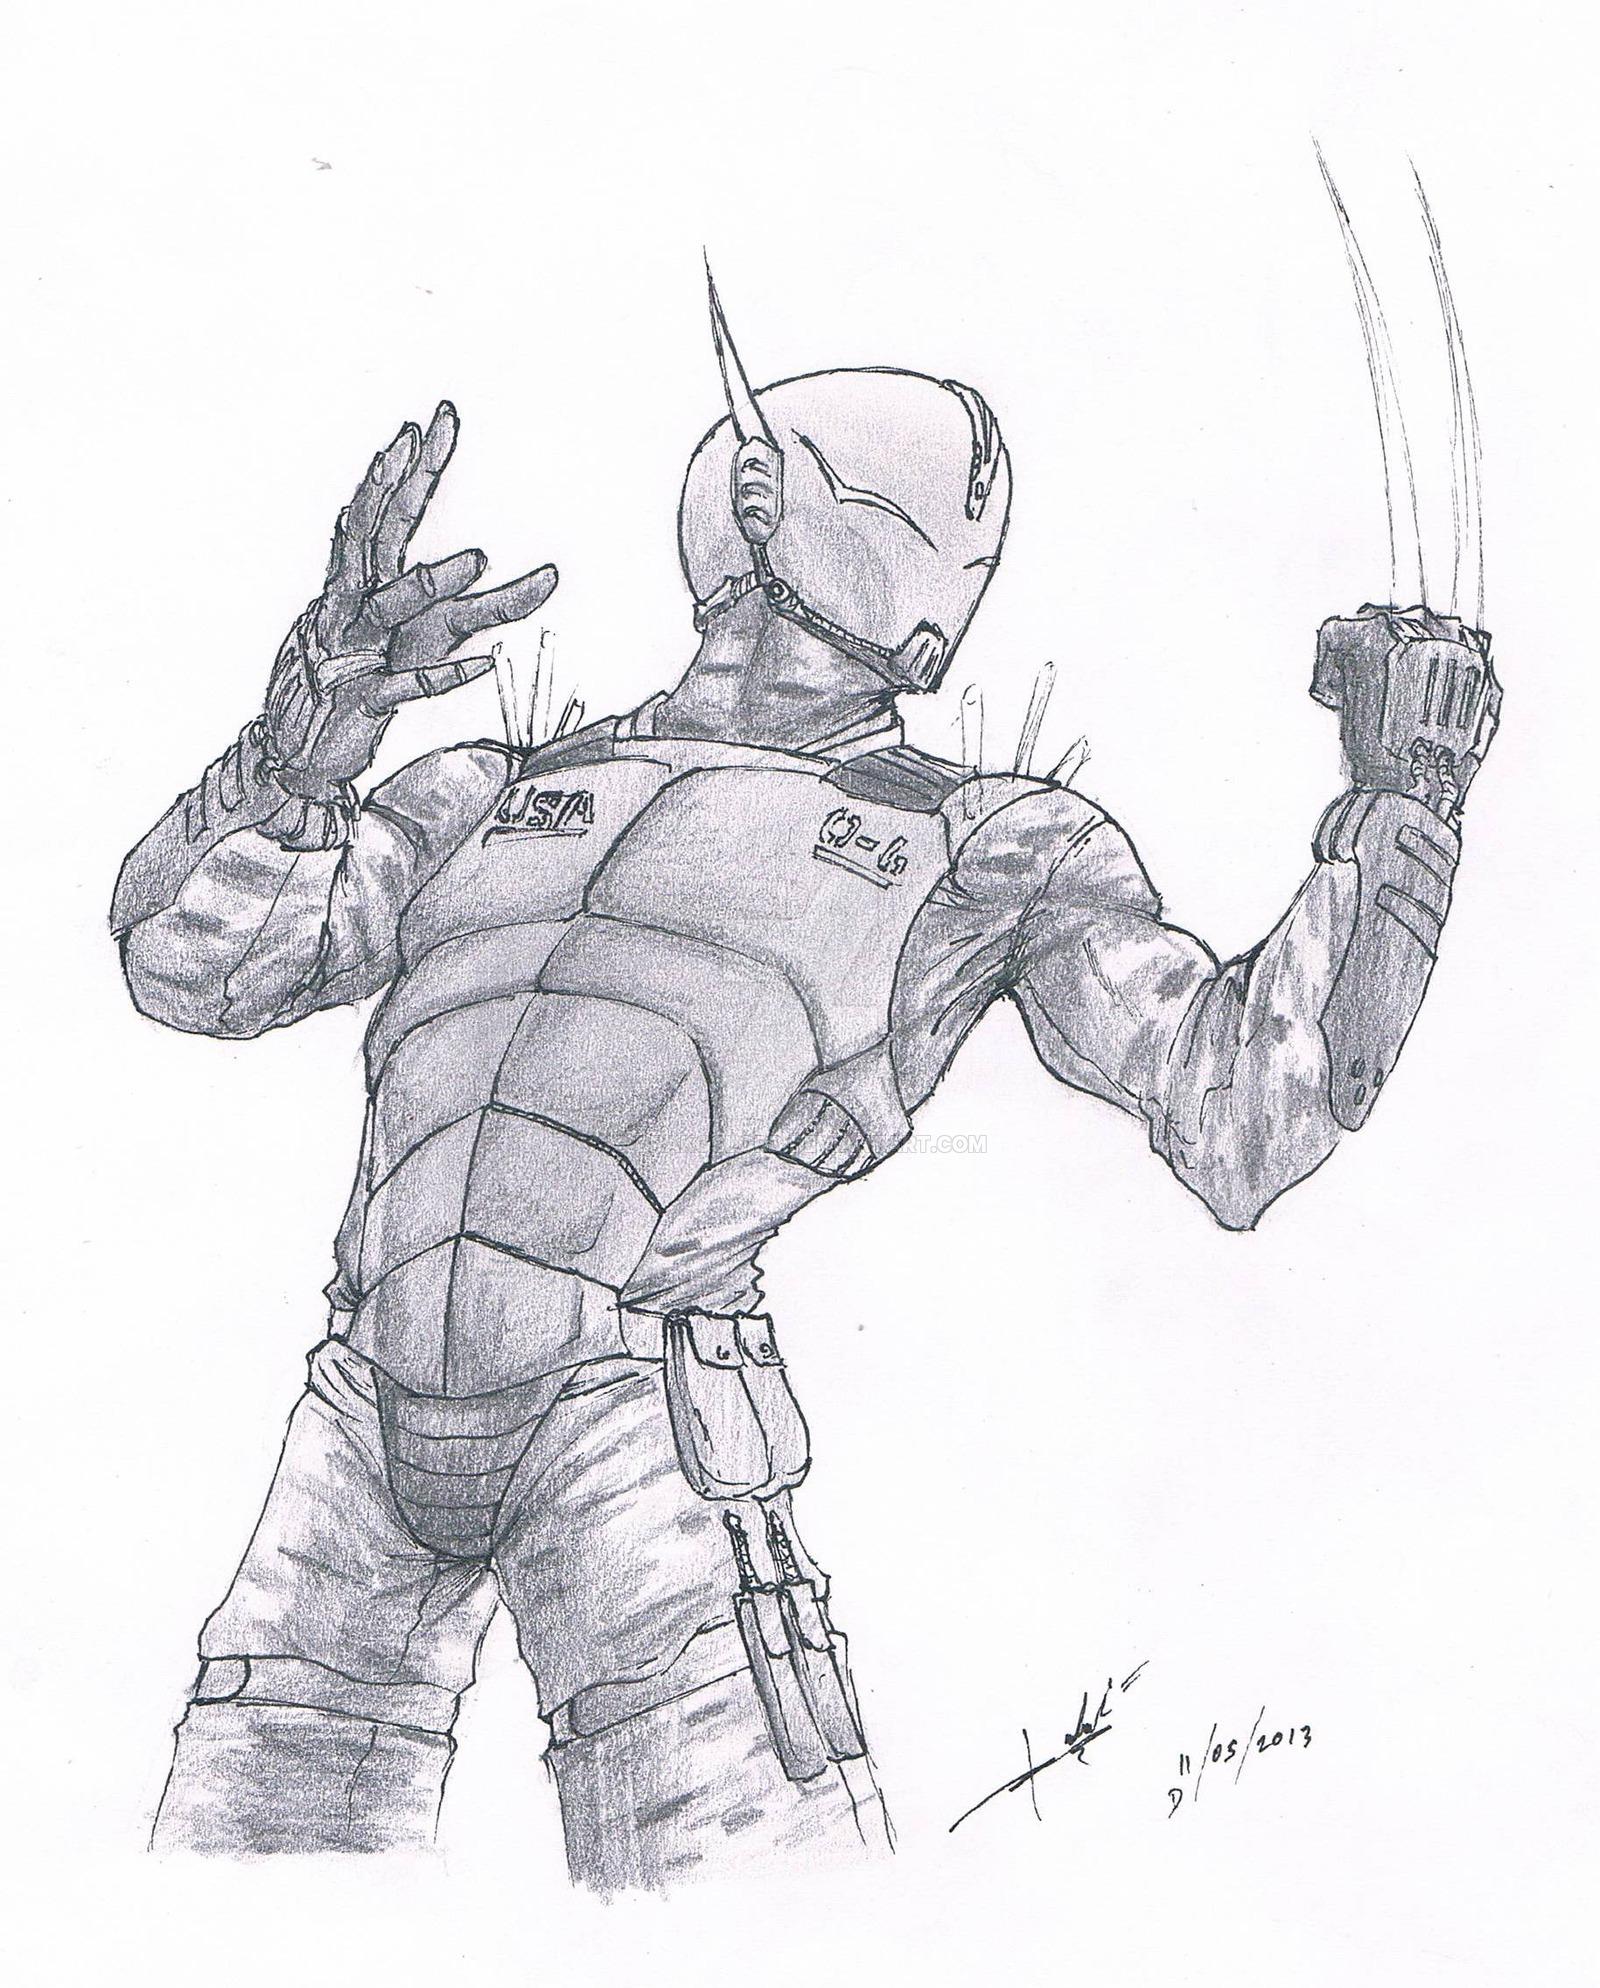 Drawn soldier futuristic Futuristic of Search Drawing soldier